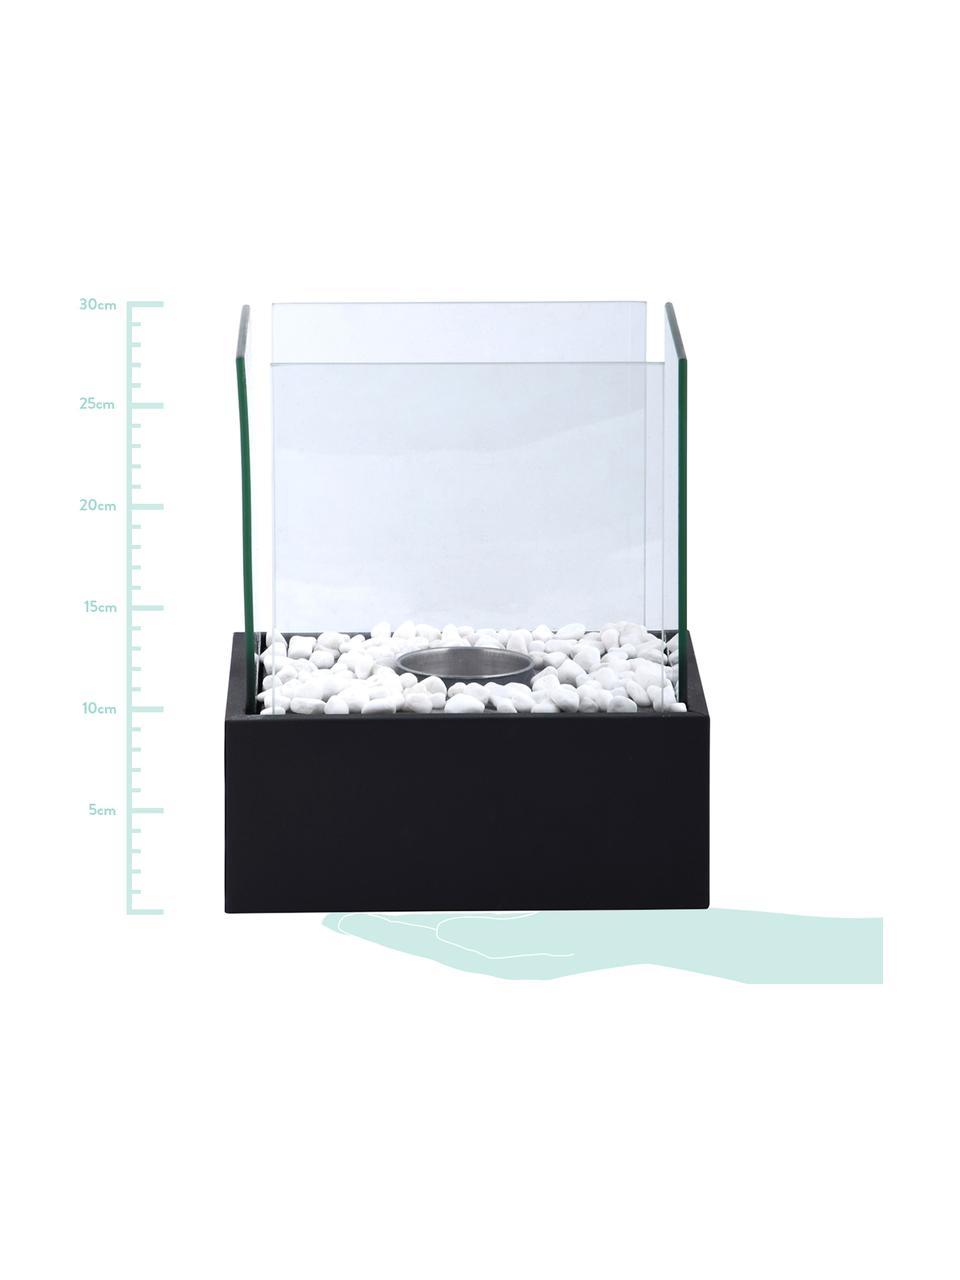 Bruciatore a bioetanolo Damin, Nero, trasparente, Larg. 25 x Alt. 28 cm